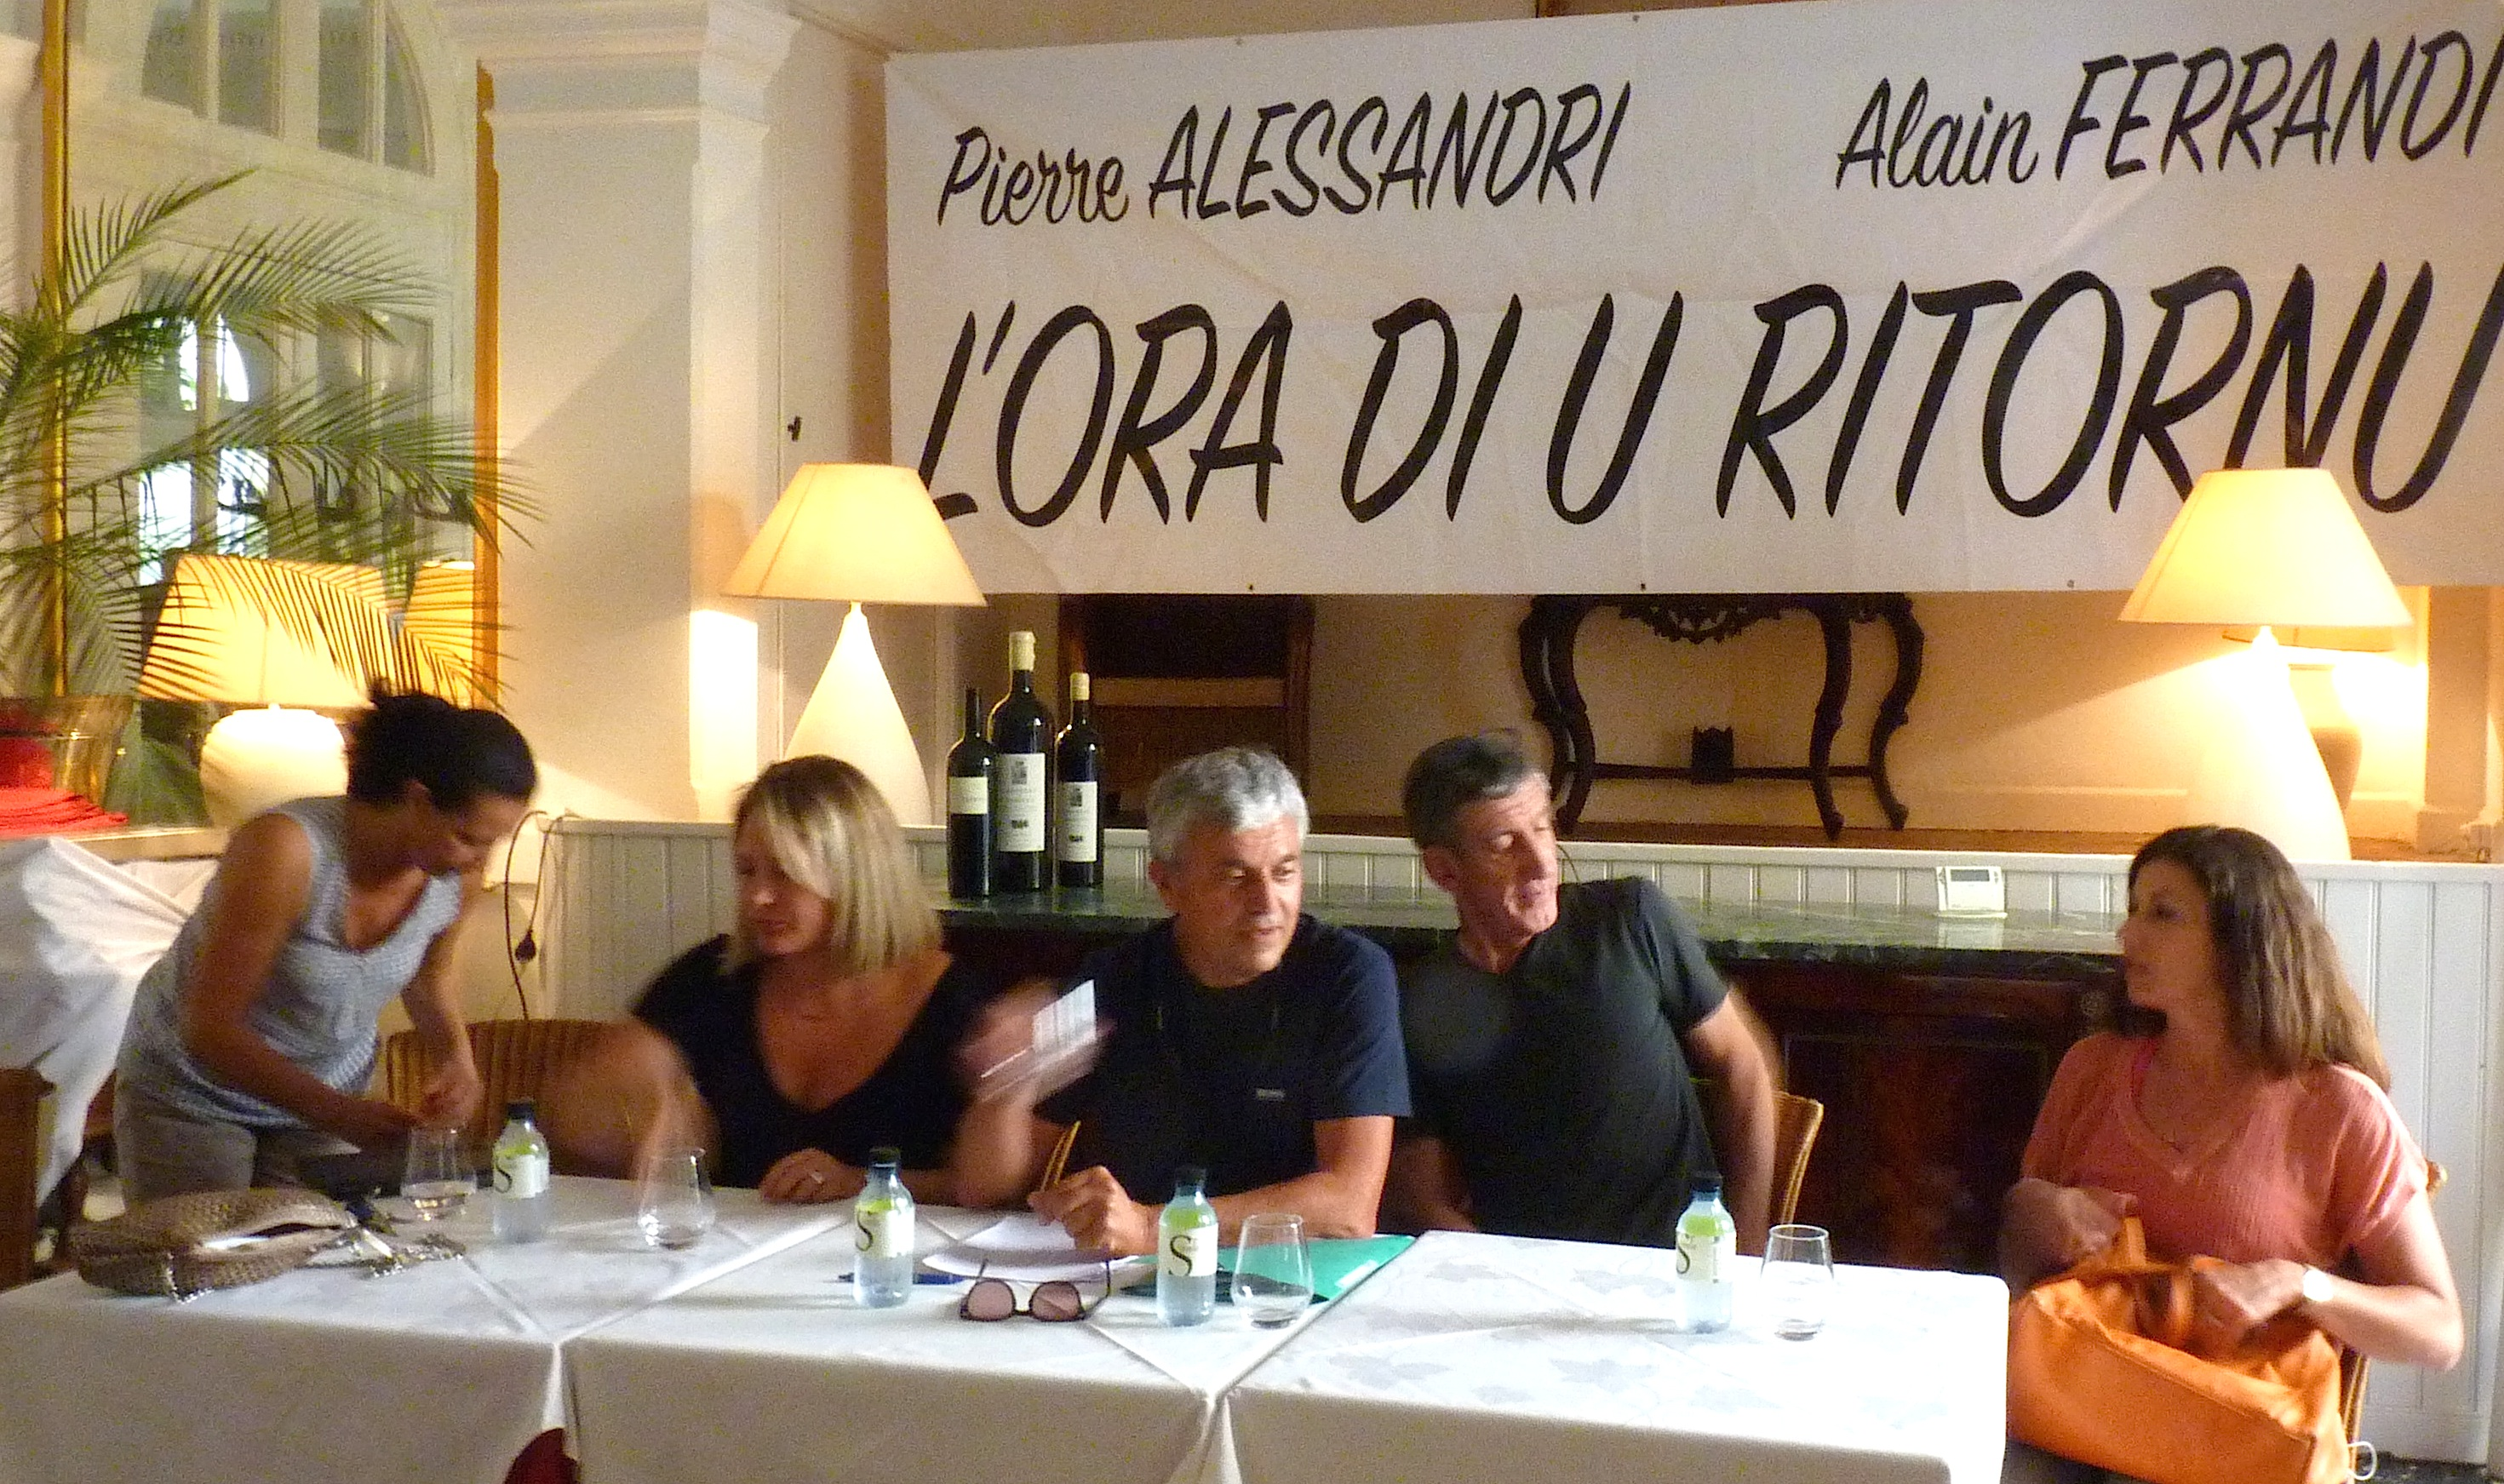 """L'ora di u ritornu"" : Pierre Alessandri et Alain Ferrandi bientôt fixés sur leur rapprochement ?"